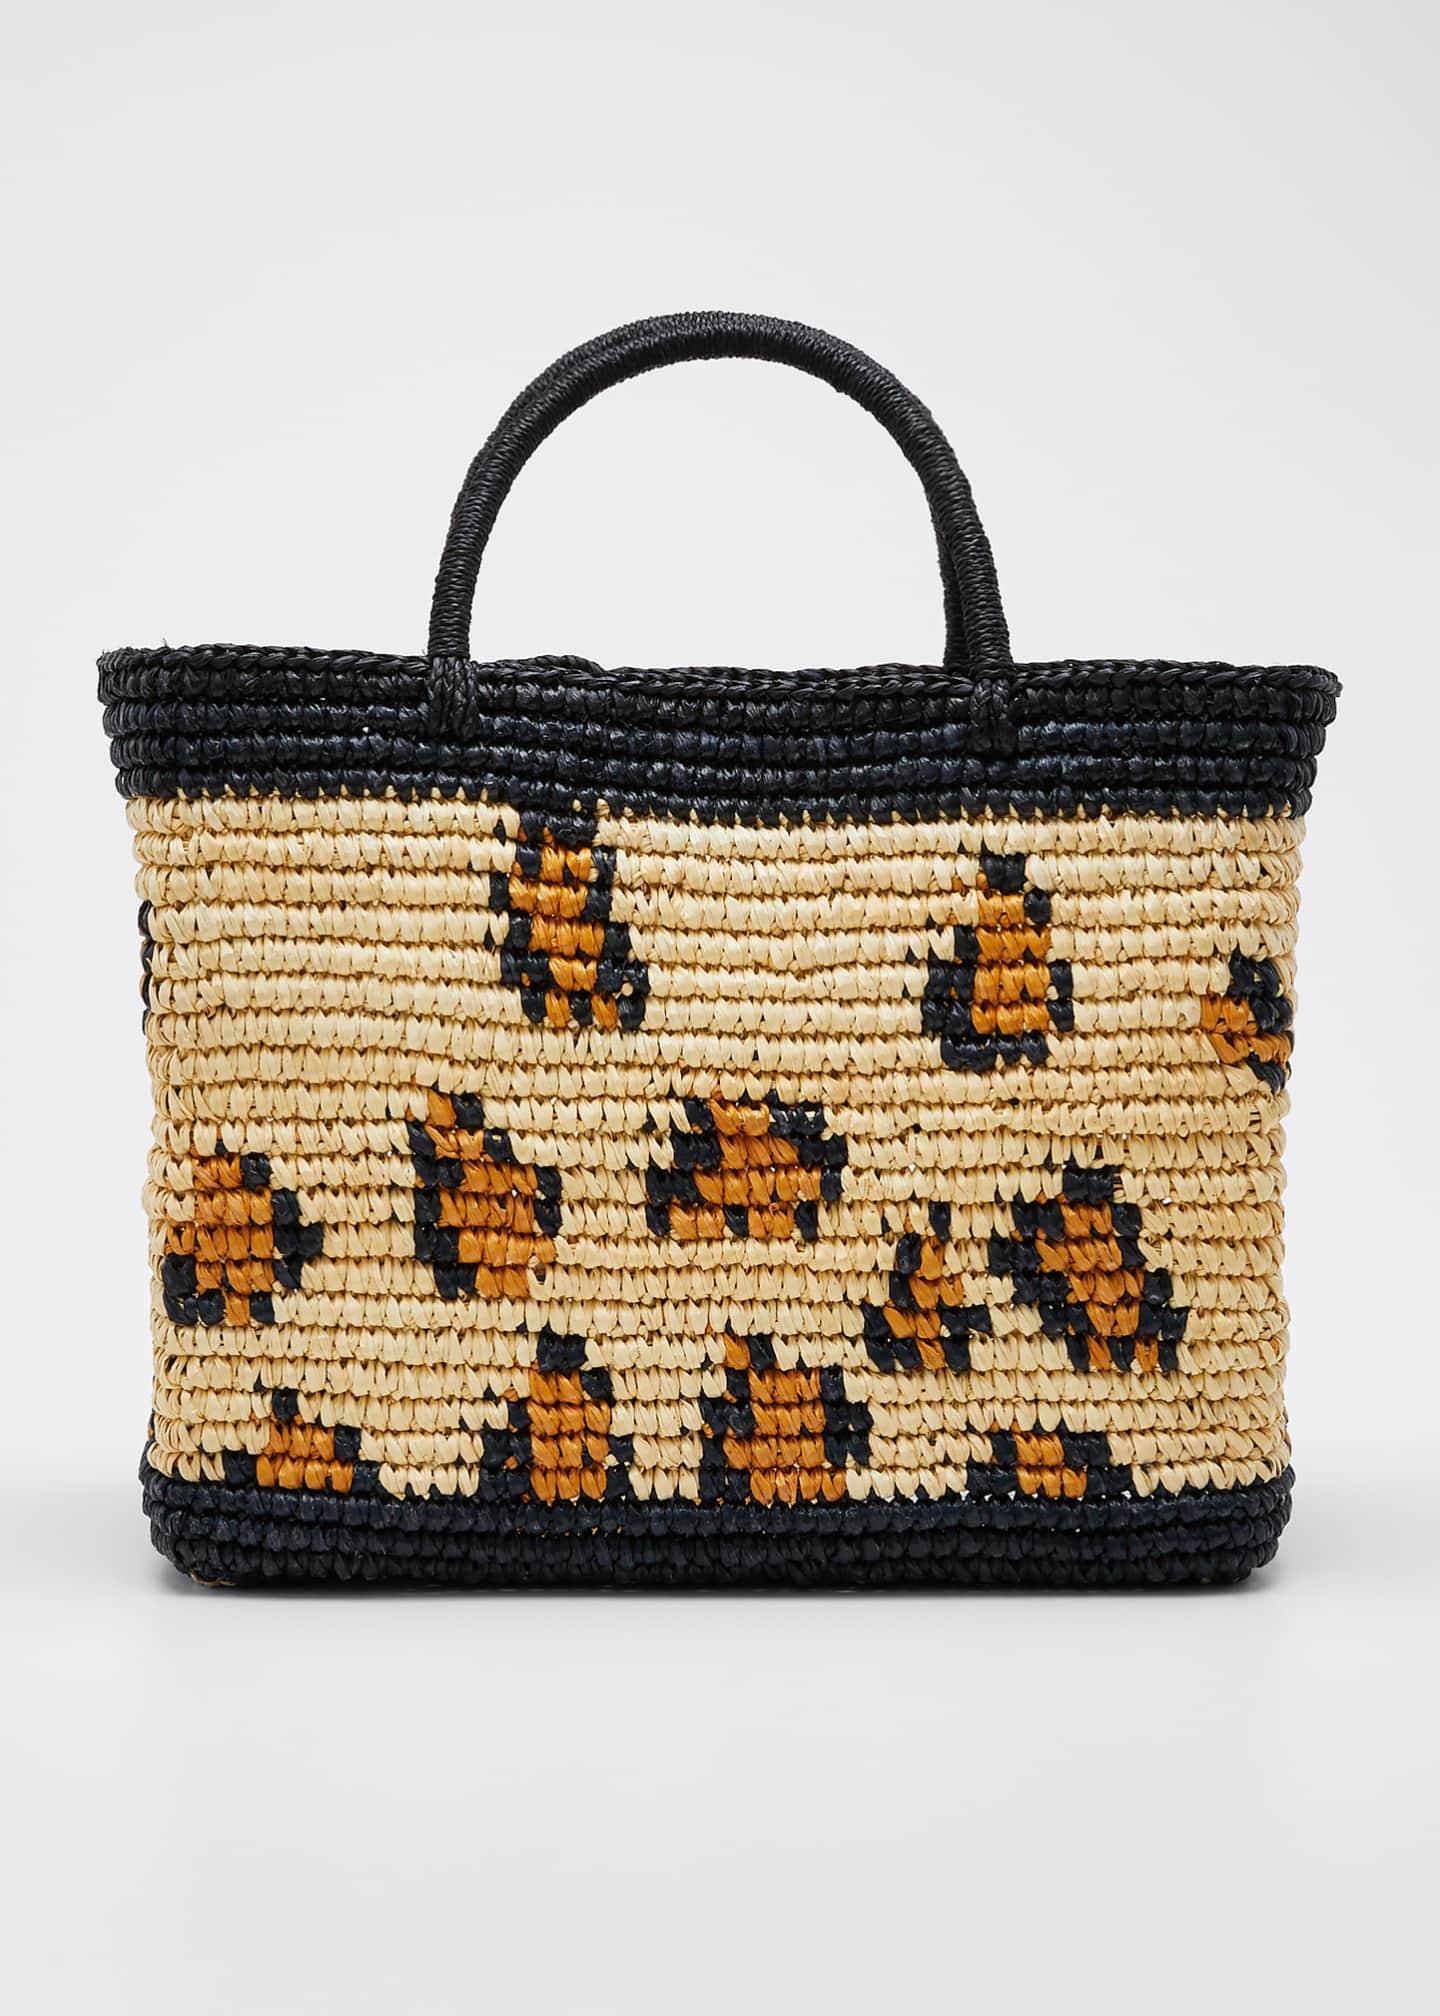 Sensi Studio Leopard-Print Straw Tote Bag